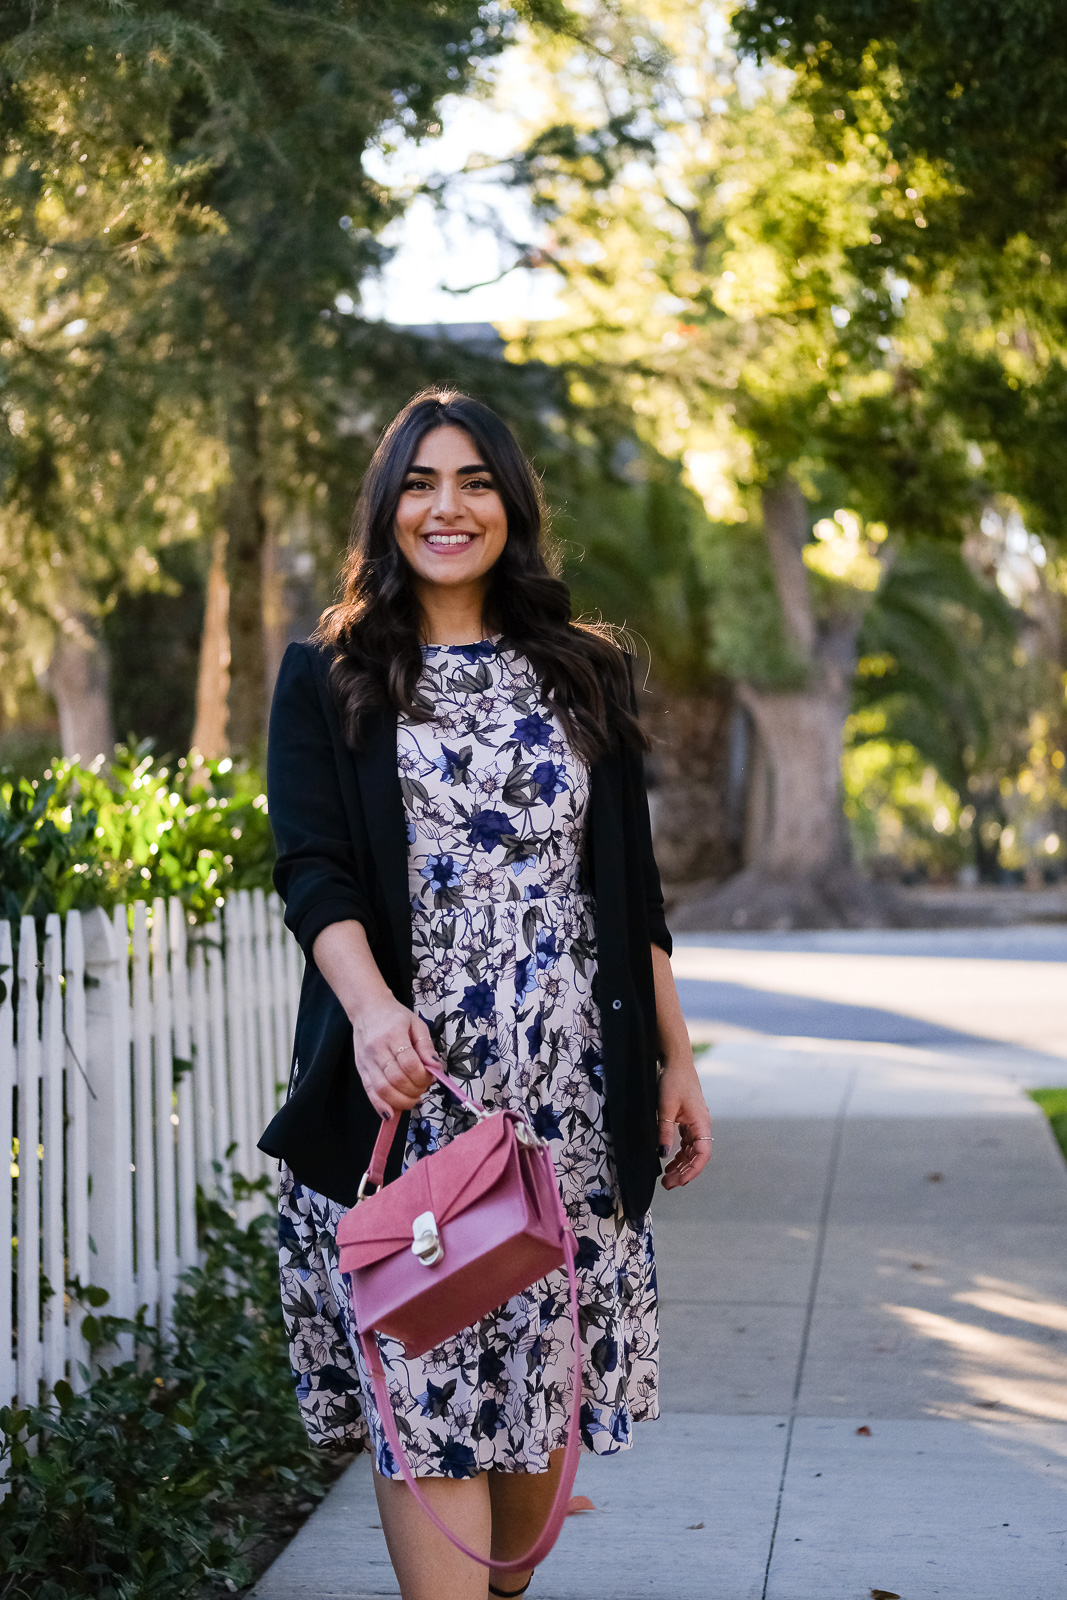 Floral dress and black blazer job interview